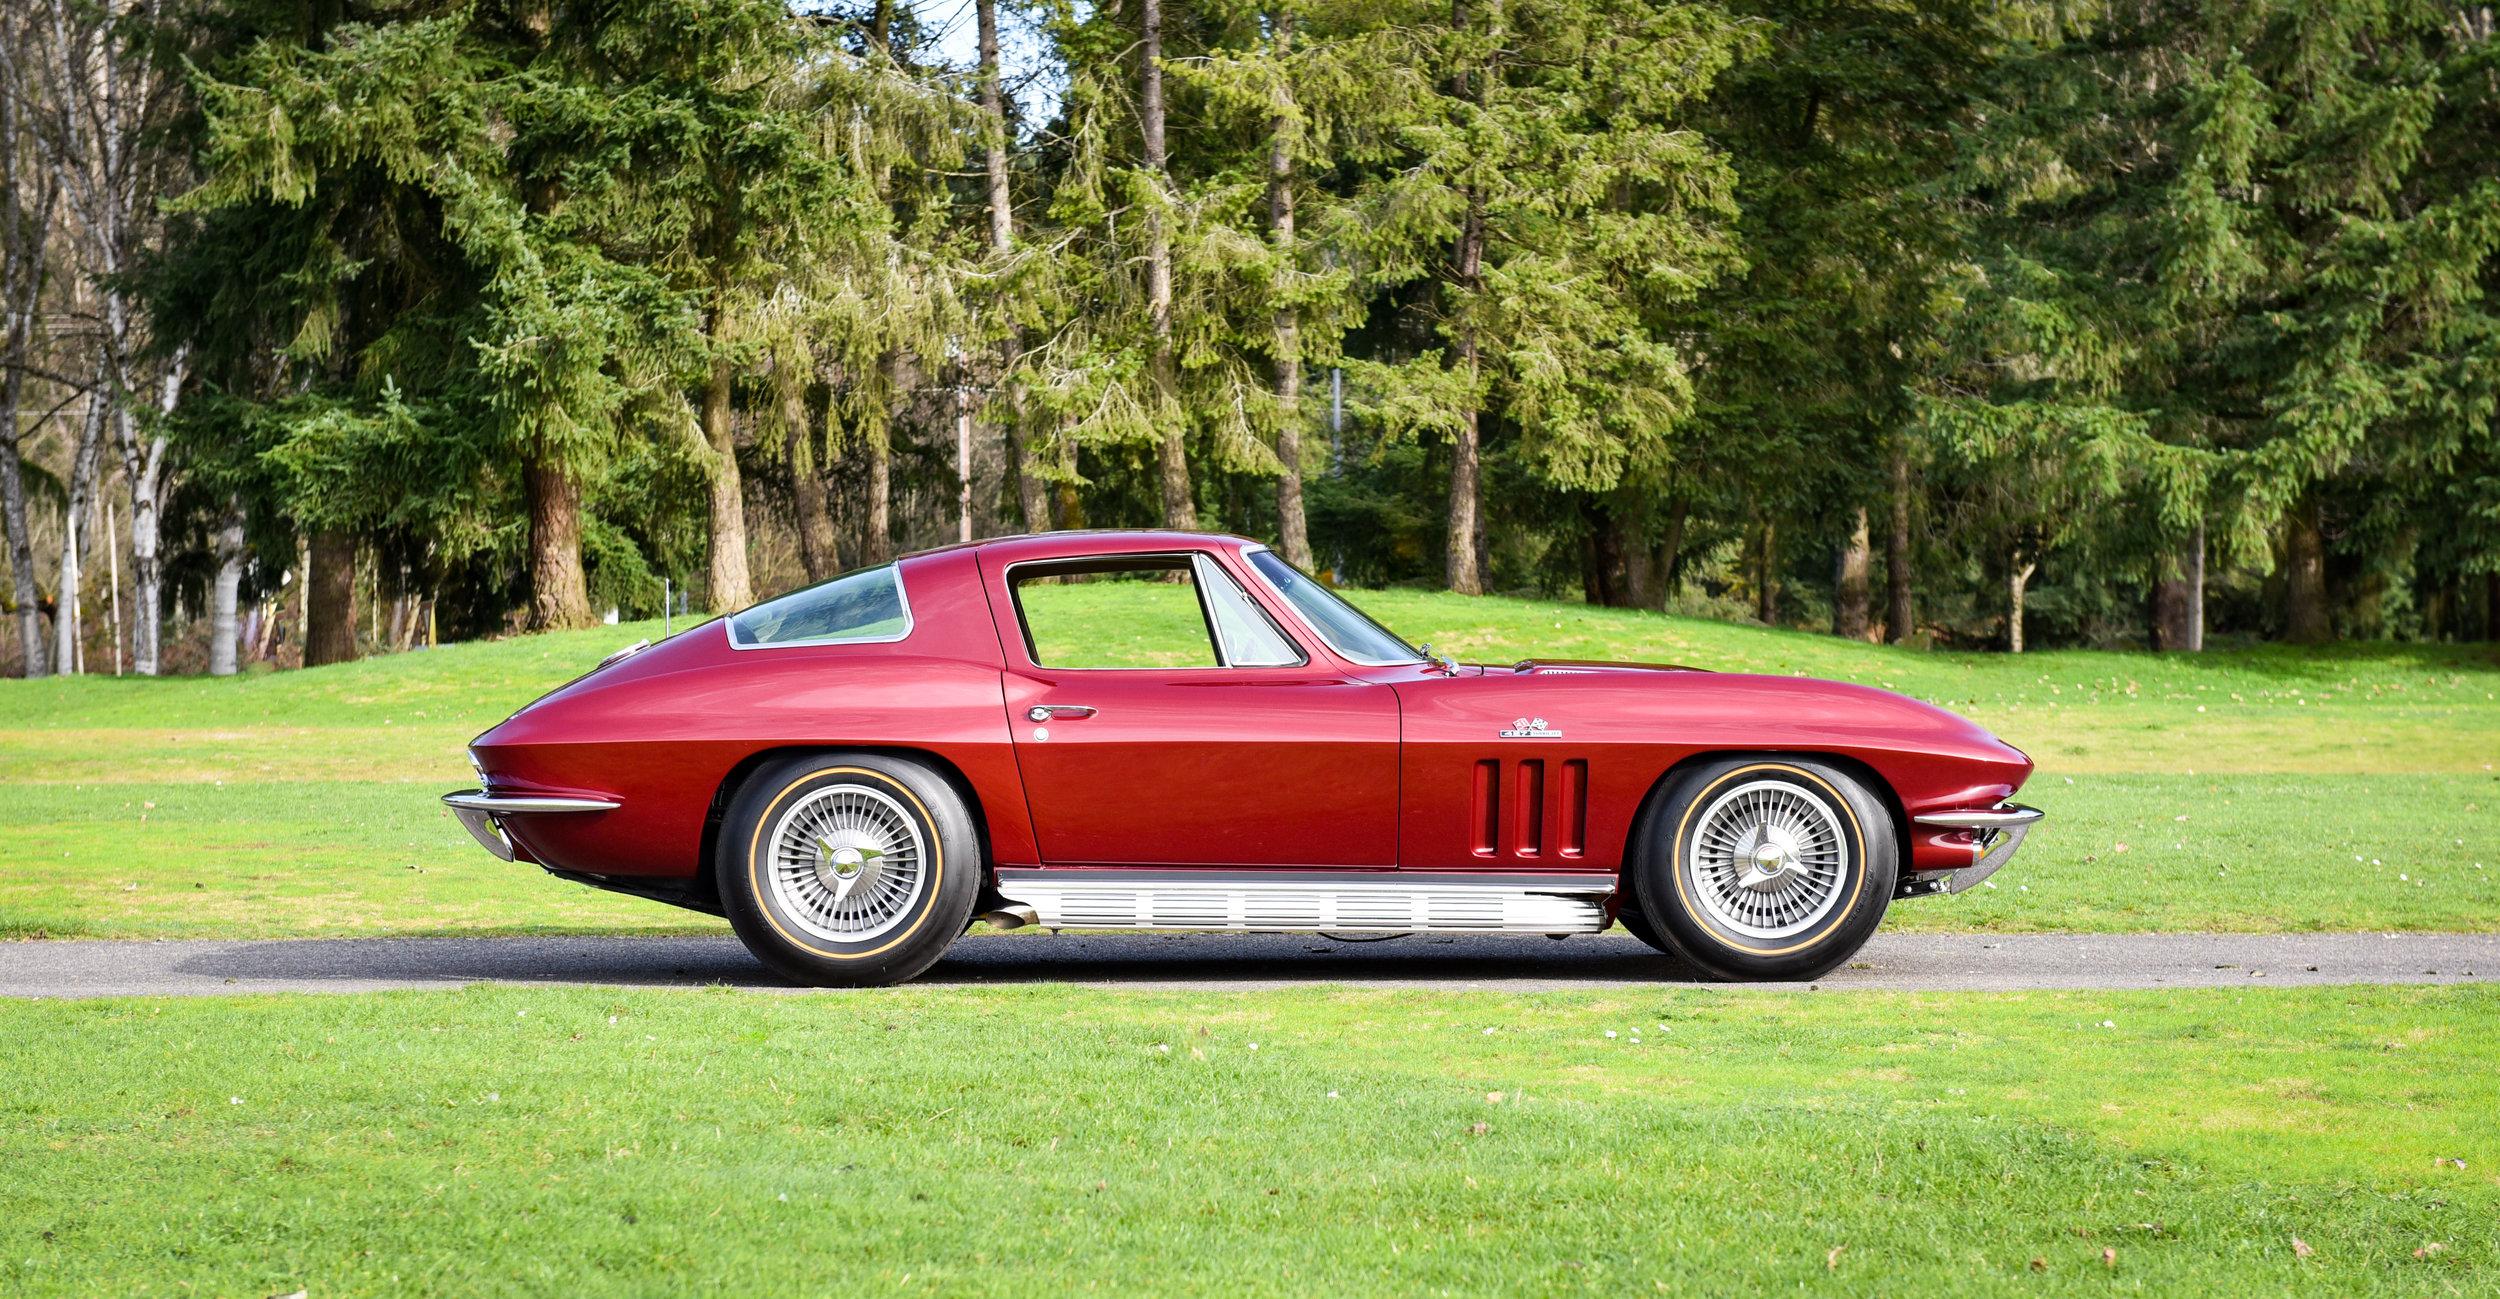 1966 Chevrolet Corvette 427 Coupe Northwest European